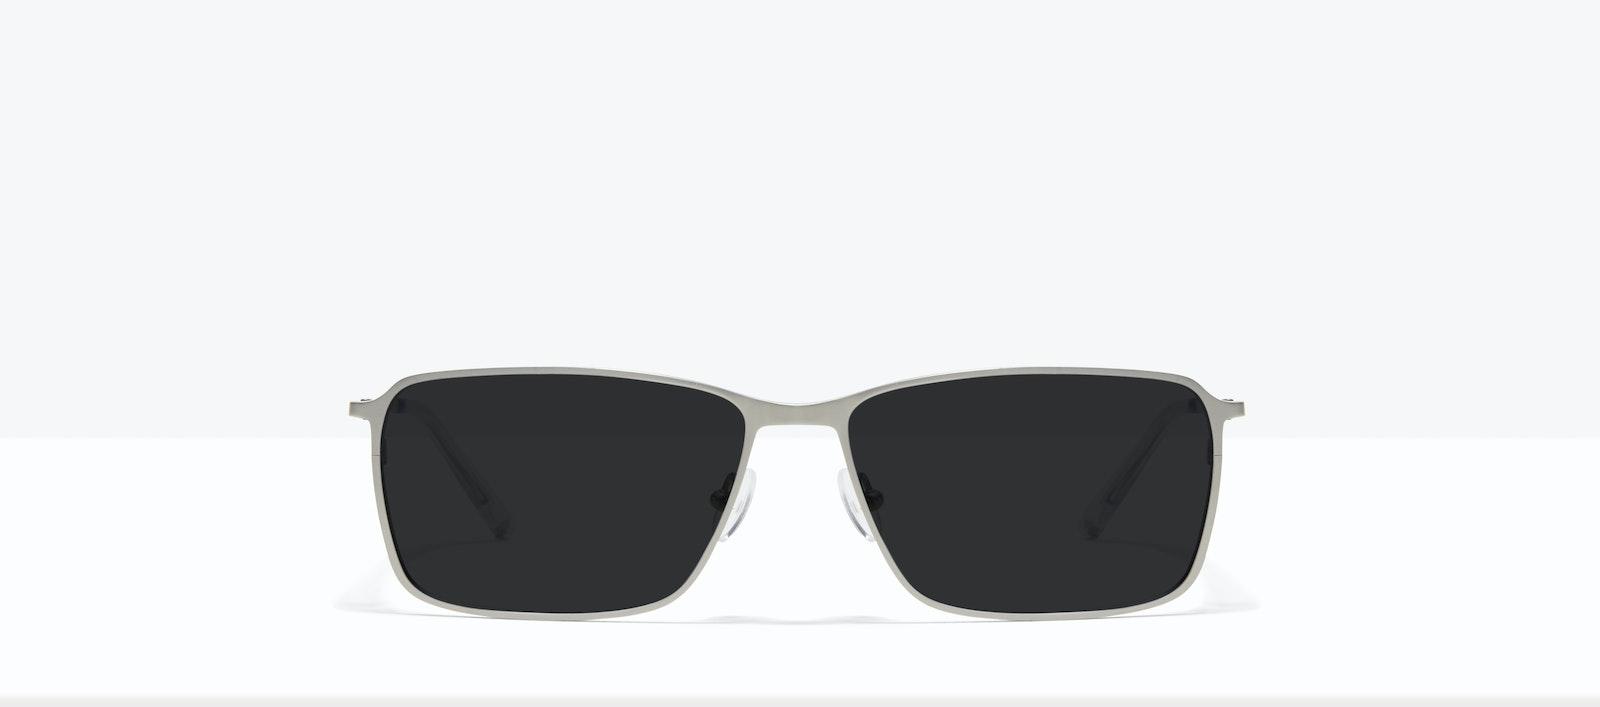 Affordable Fashion Glasses Square Sunglasses Men Drive Silver Front